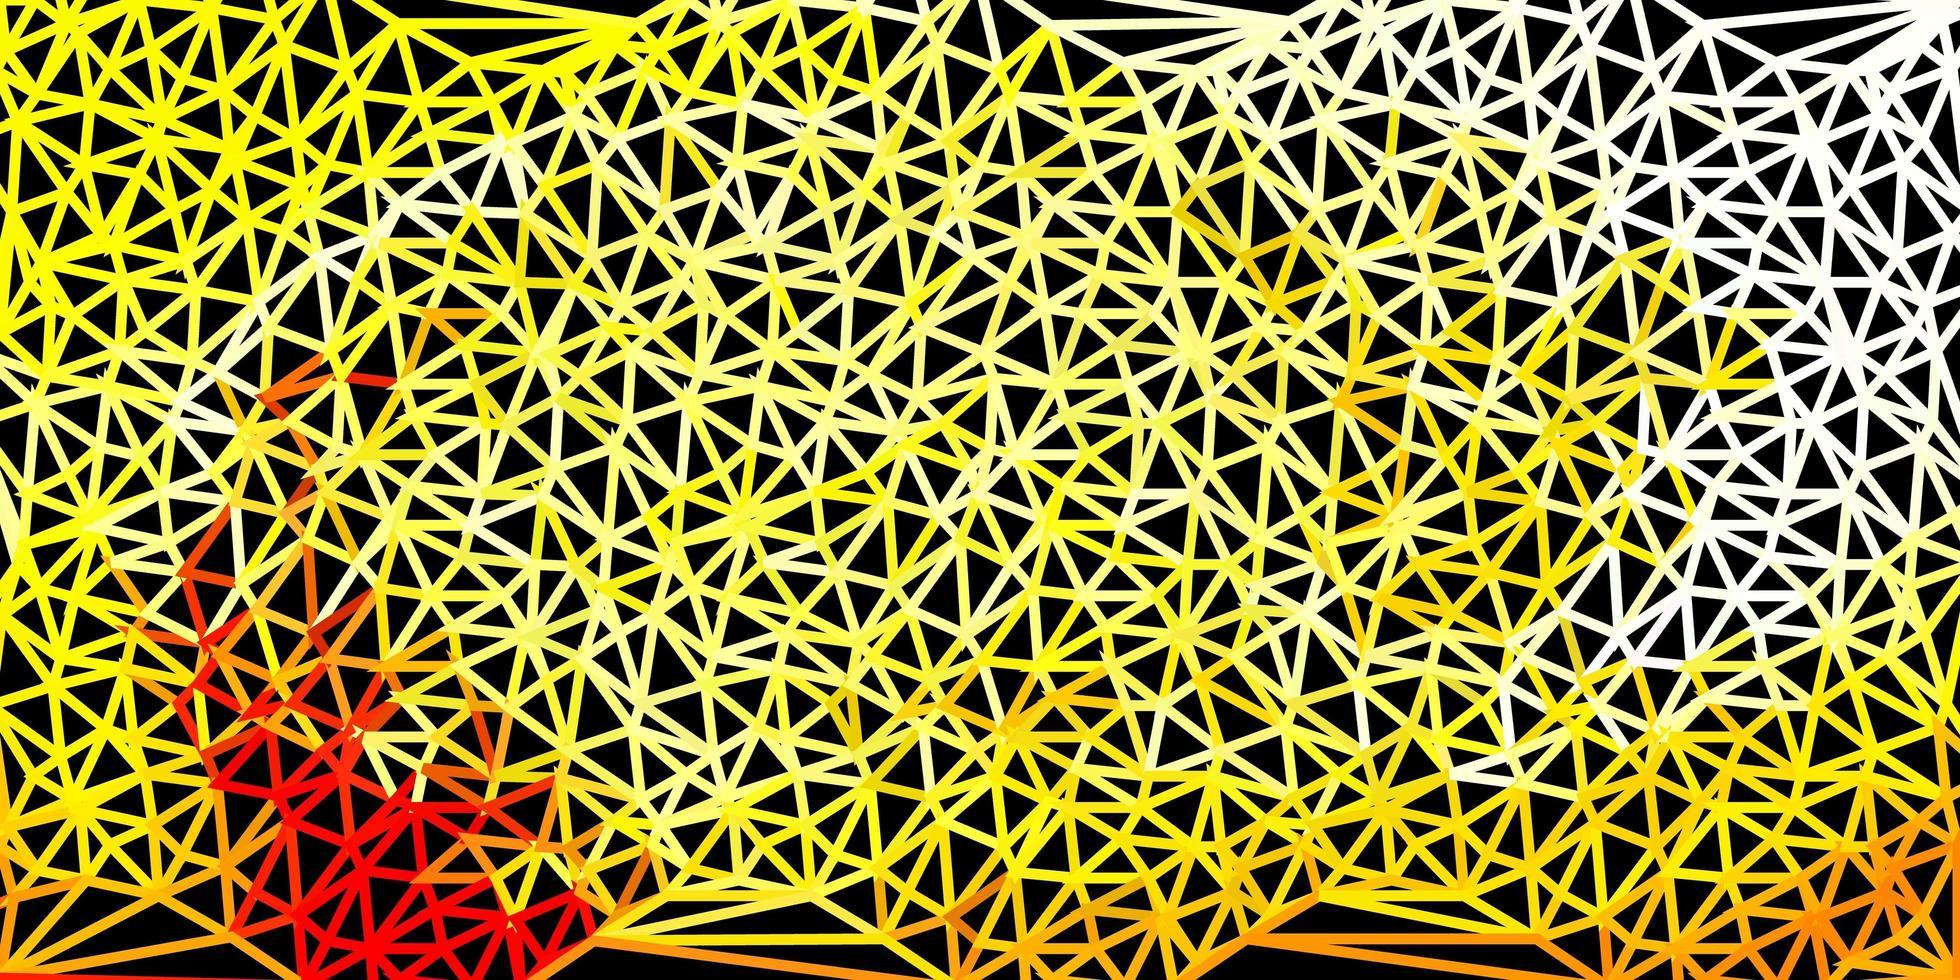 hellroter, gelber Vektordreieckmosaikhintergrund. vektor